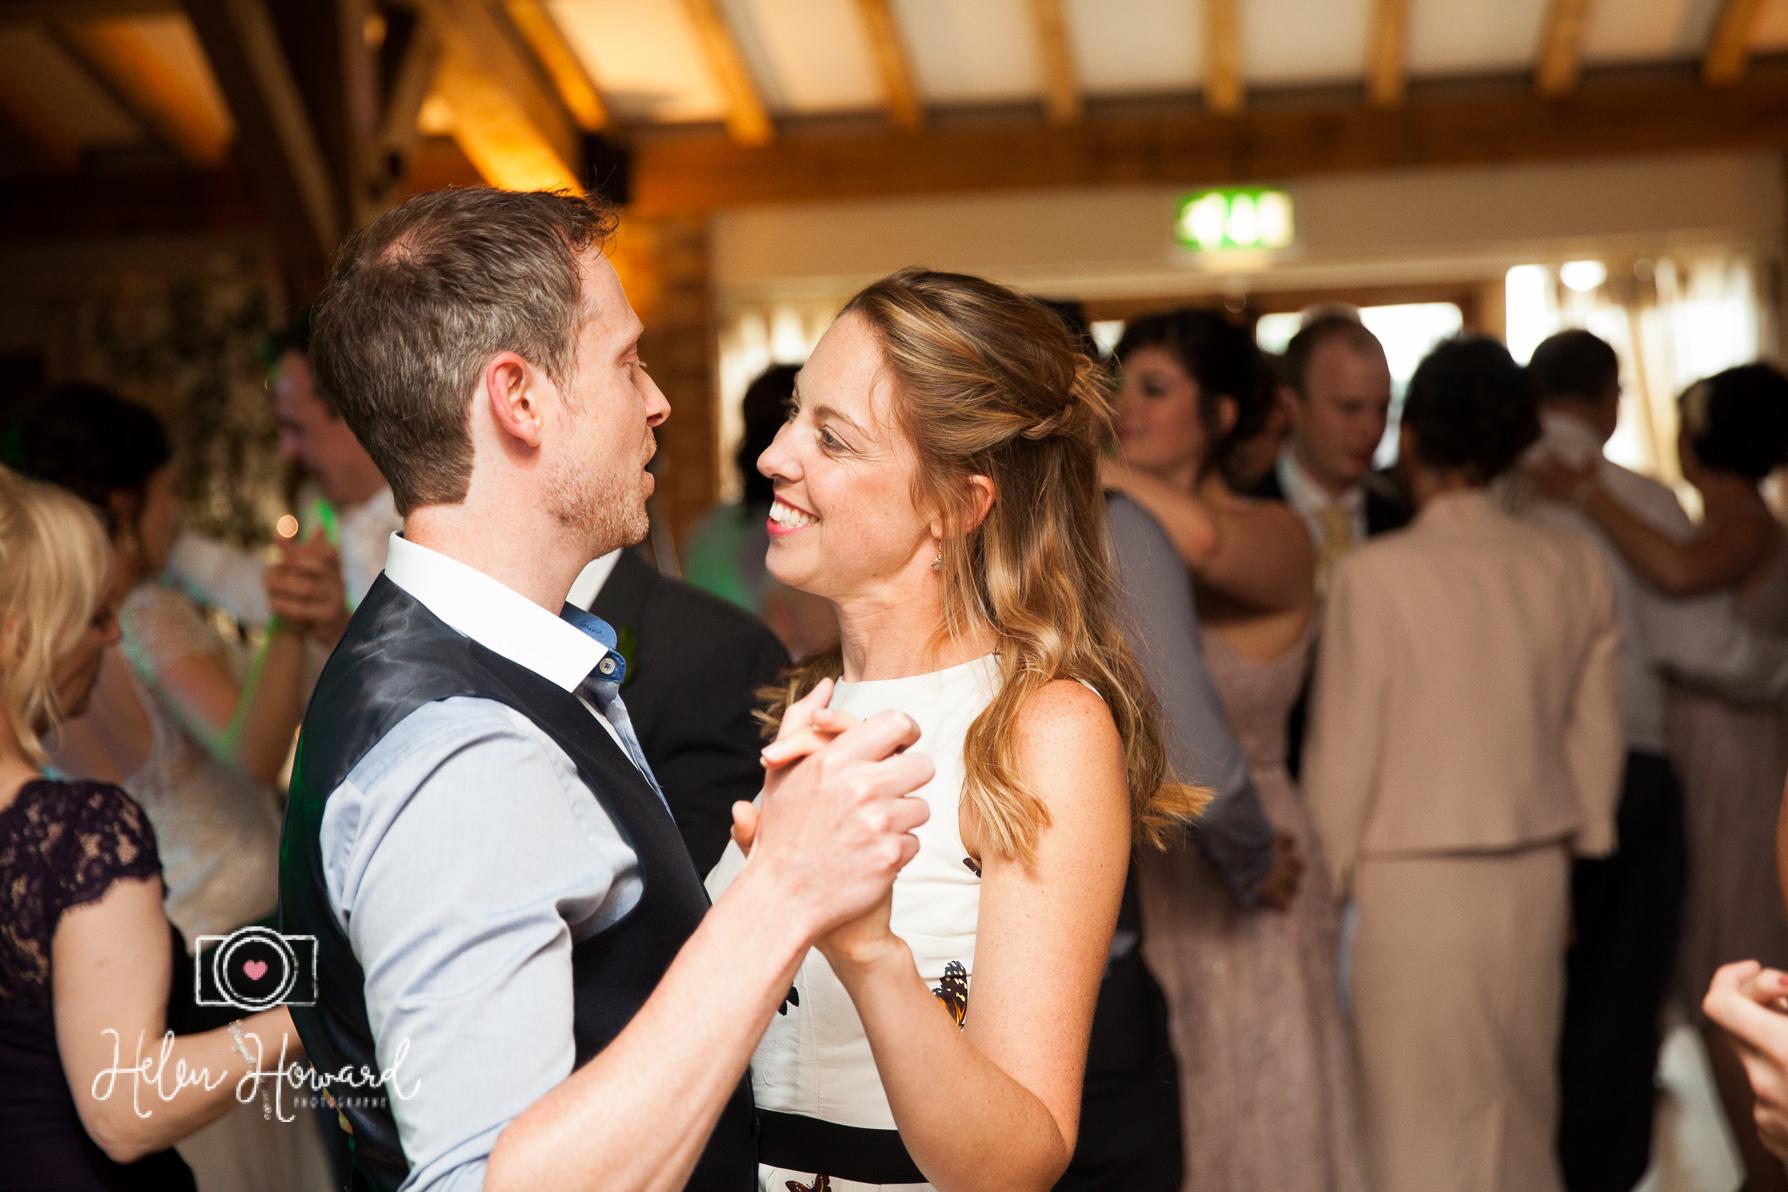 Helen Howard Photography Packington Moor Wedding-123.jpg